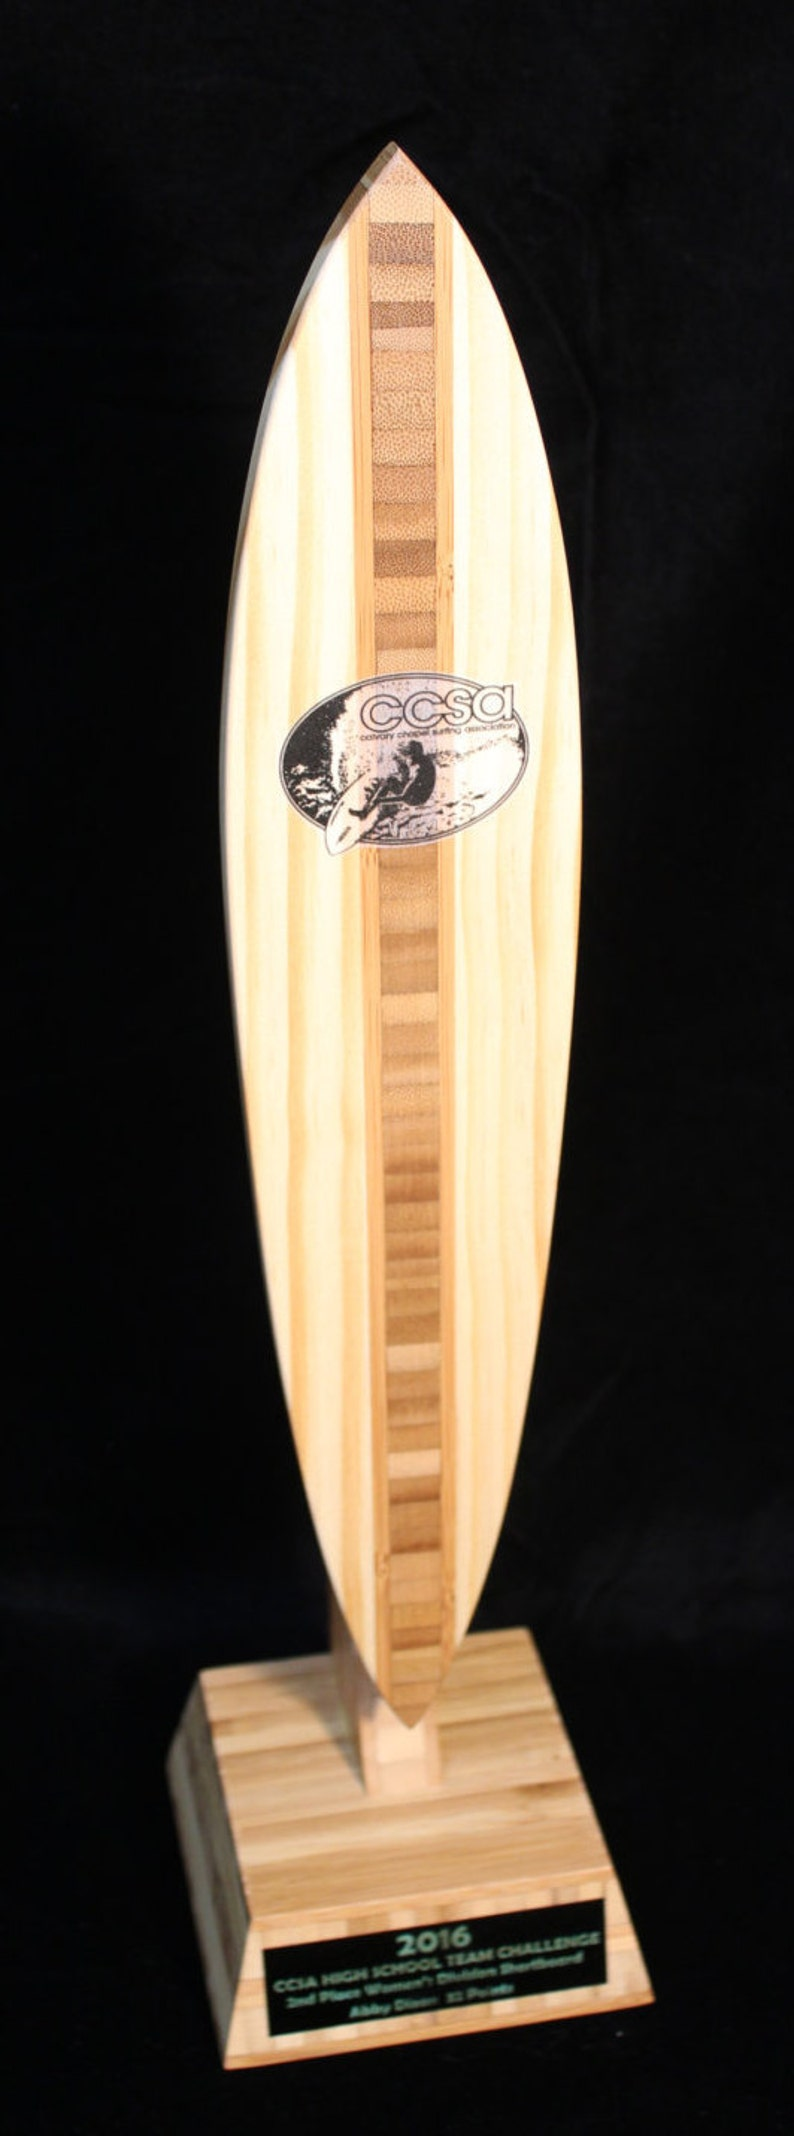 Custom Bamboo Board Surf Trophy Pintail Longboard Bodyboard by Dave C  Reynolds